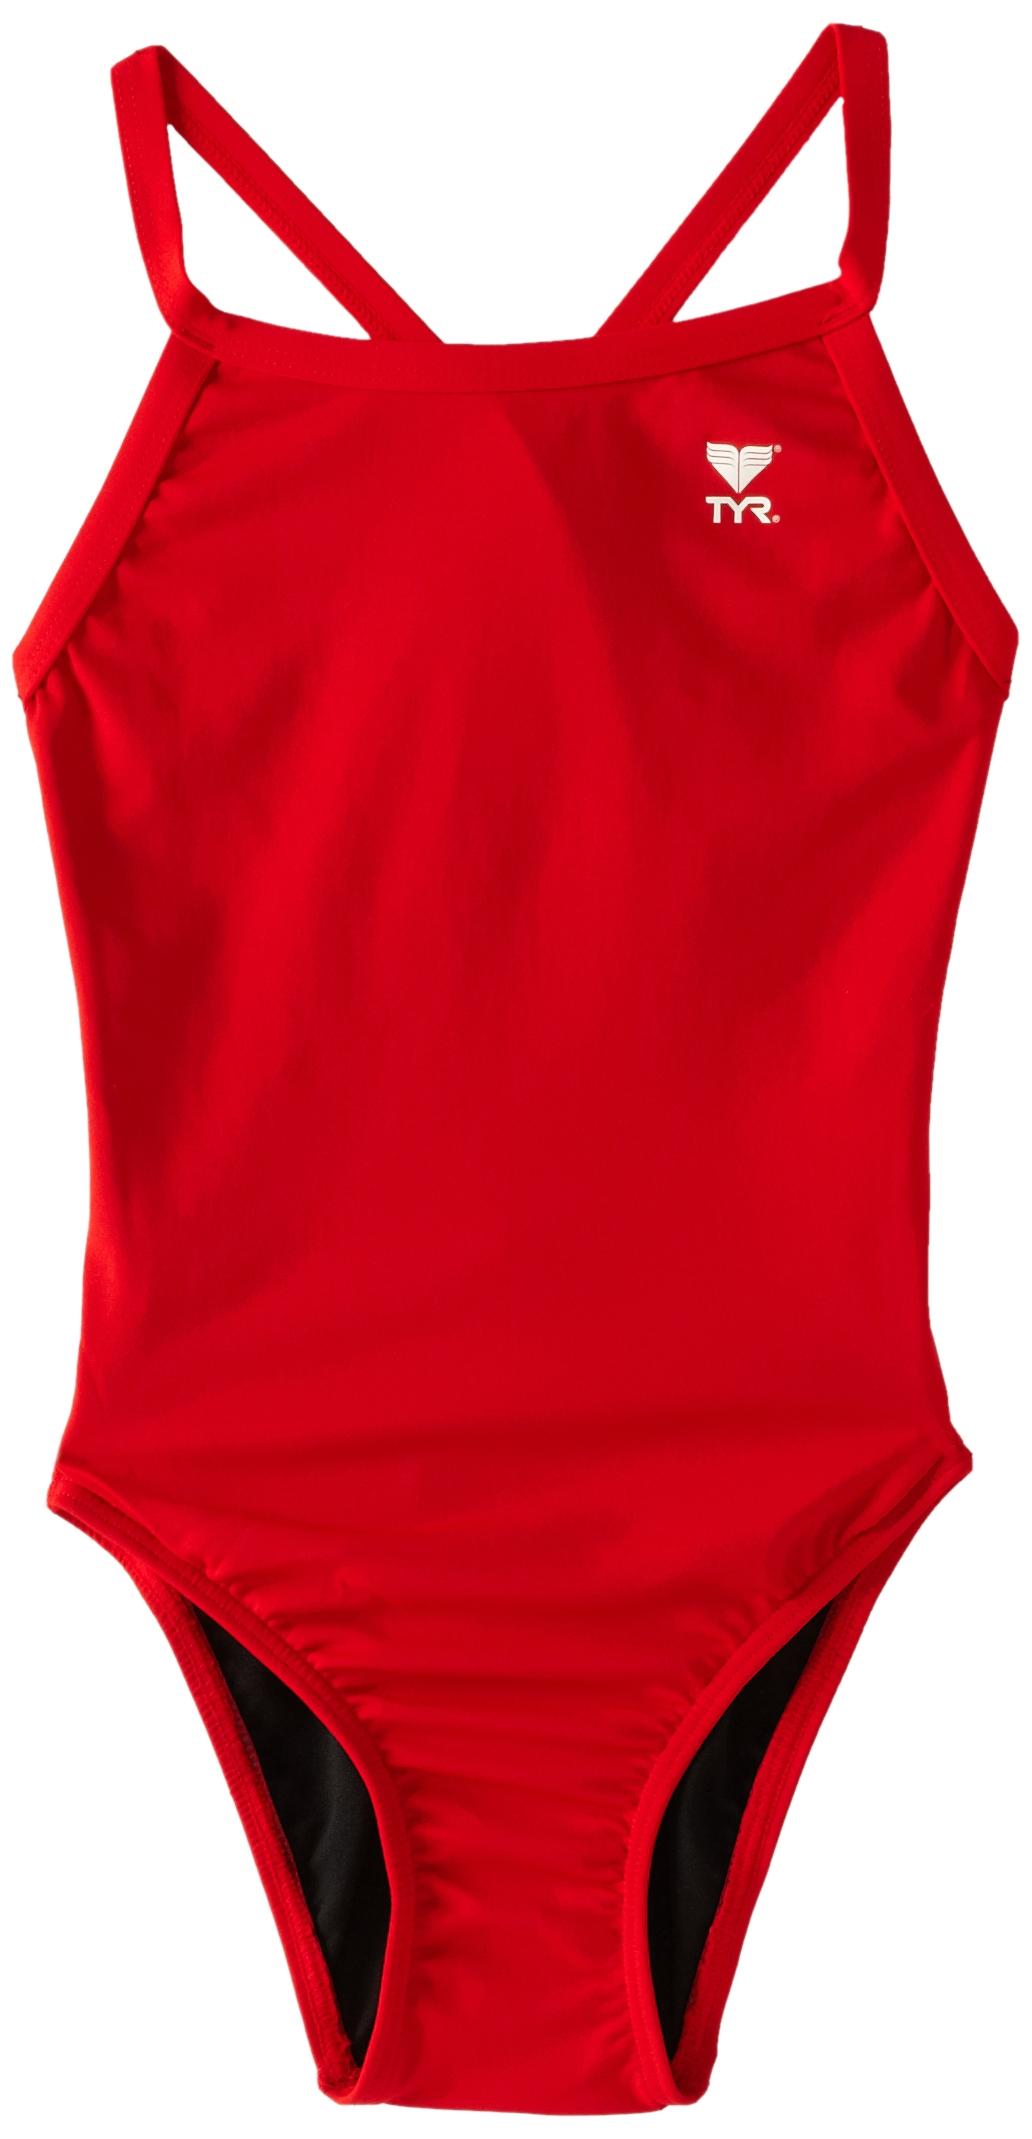 TYR Sport Girls' Solid Durafast Diamondback Swim Suit (Red, 26)